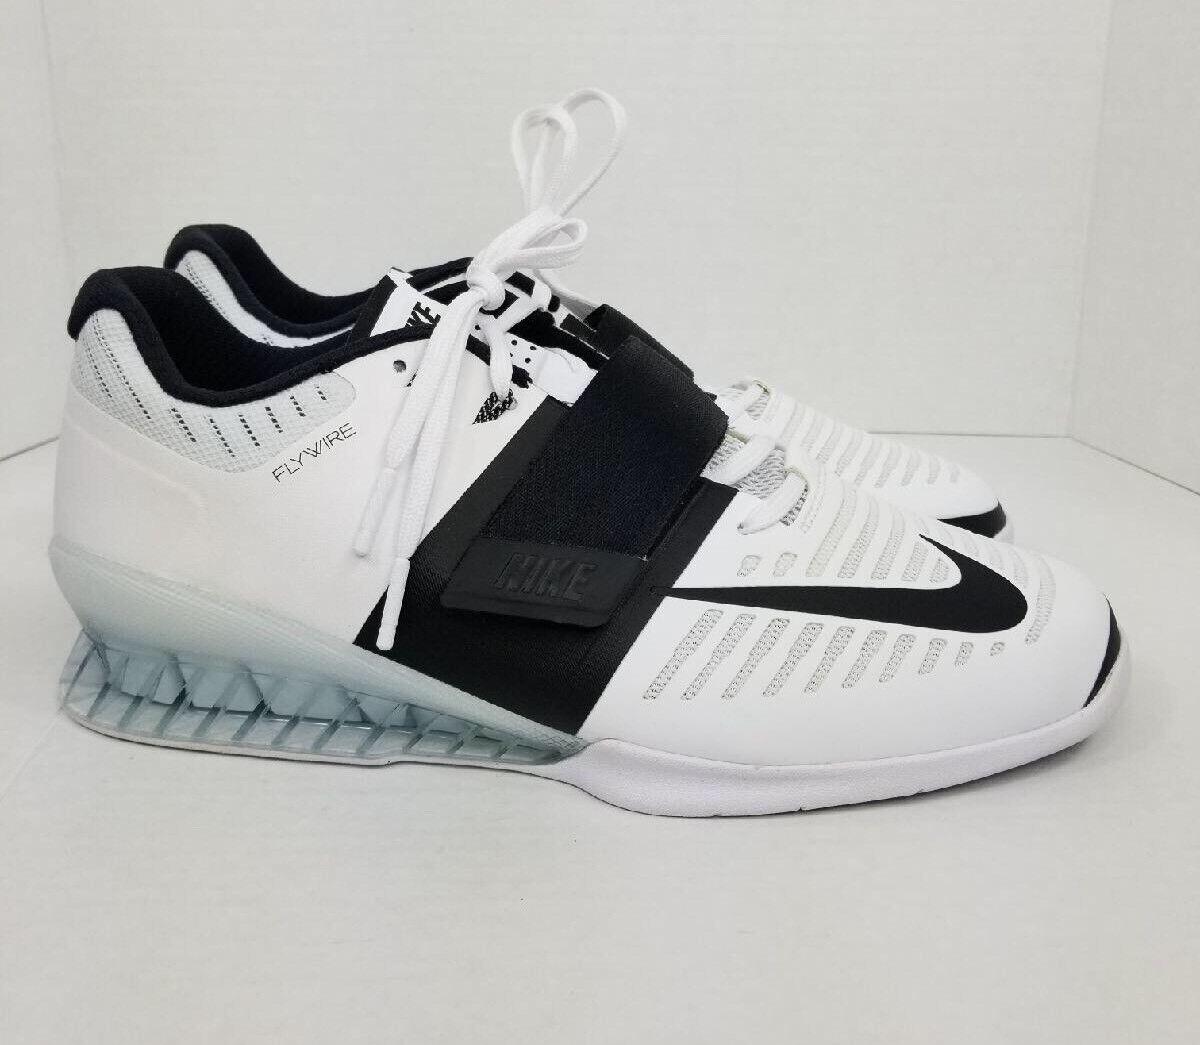 Womens Nike Romaleos 3 Powerlifting 878557-100 Size 13 weightlifting White Black